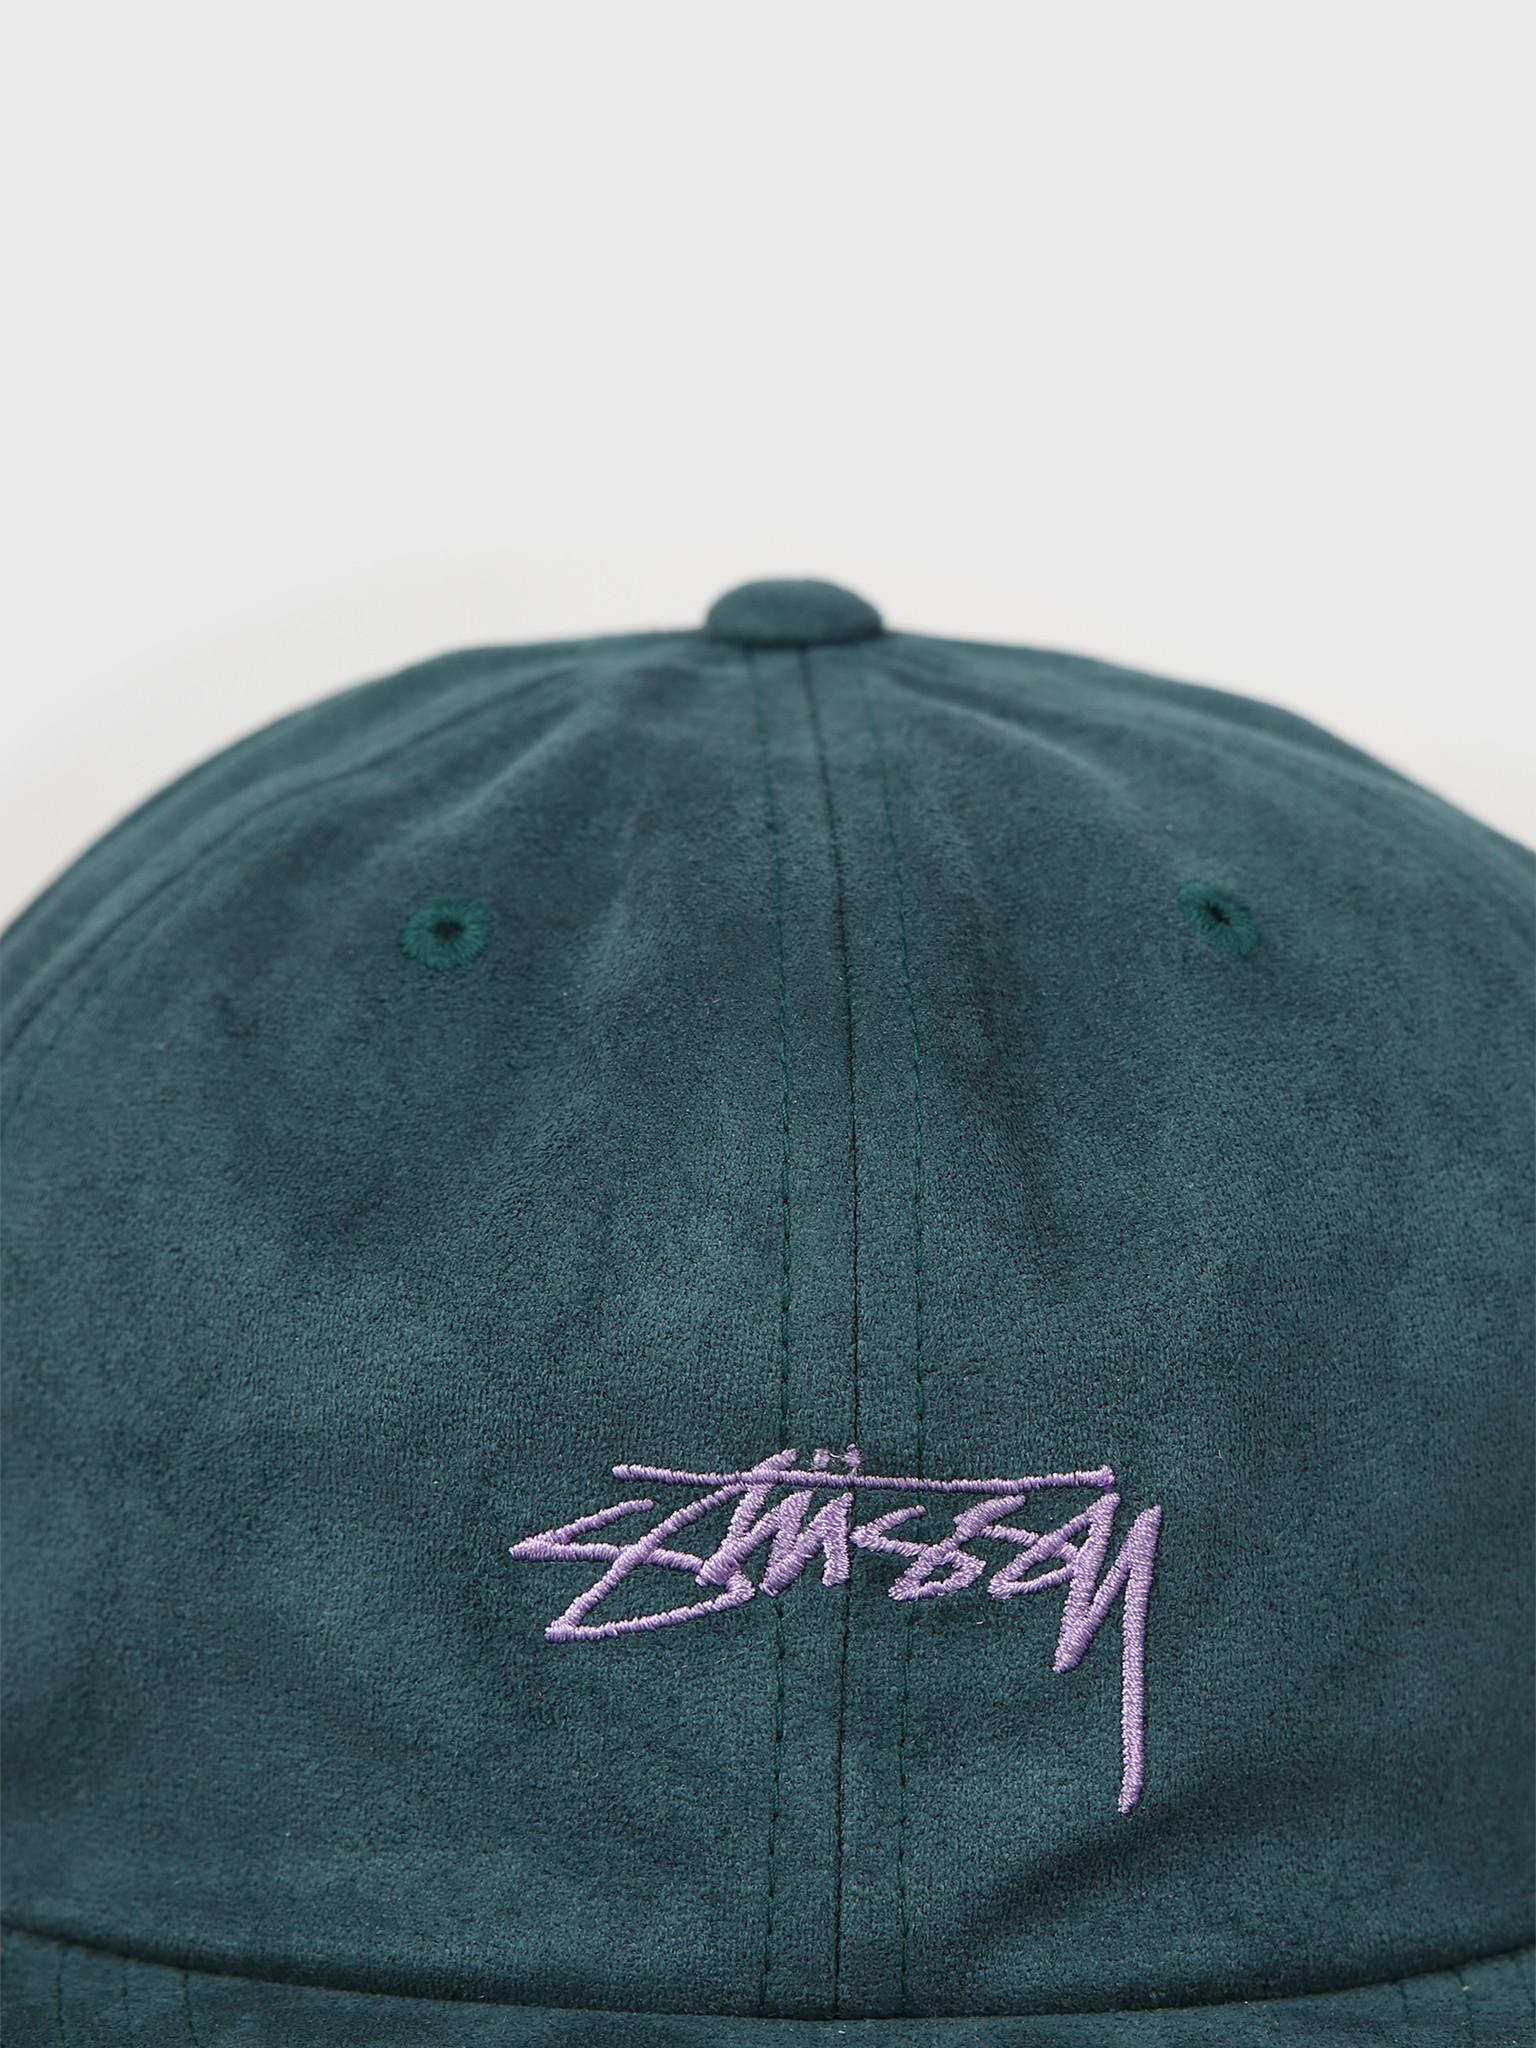 Stussy Stussy Microfiber Cap Green 131920